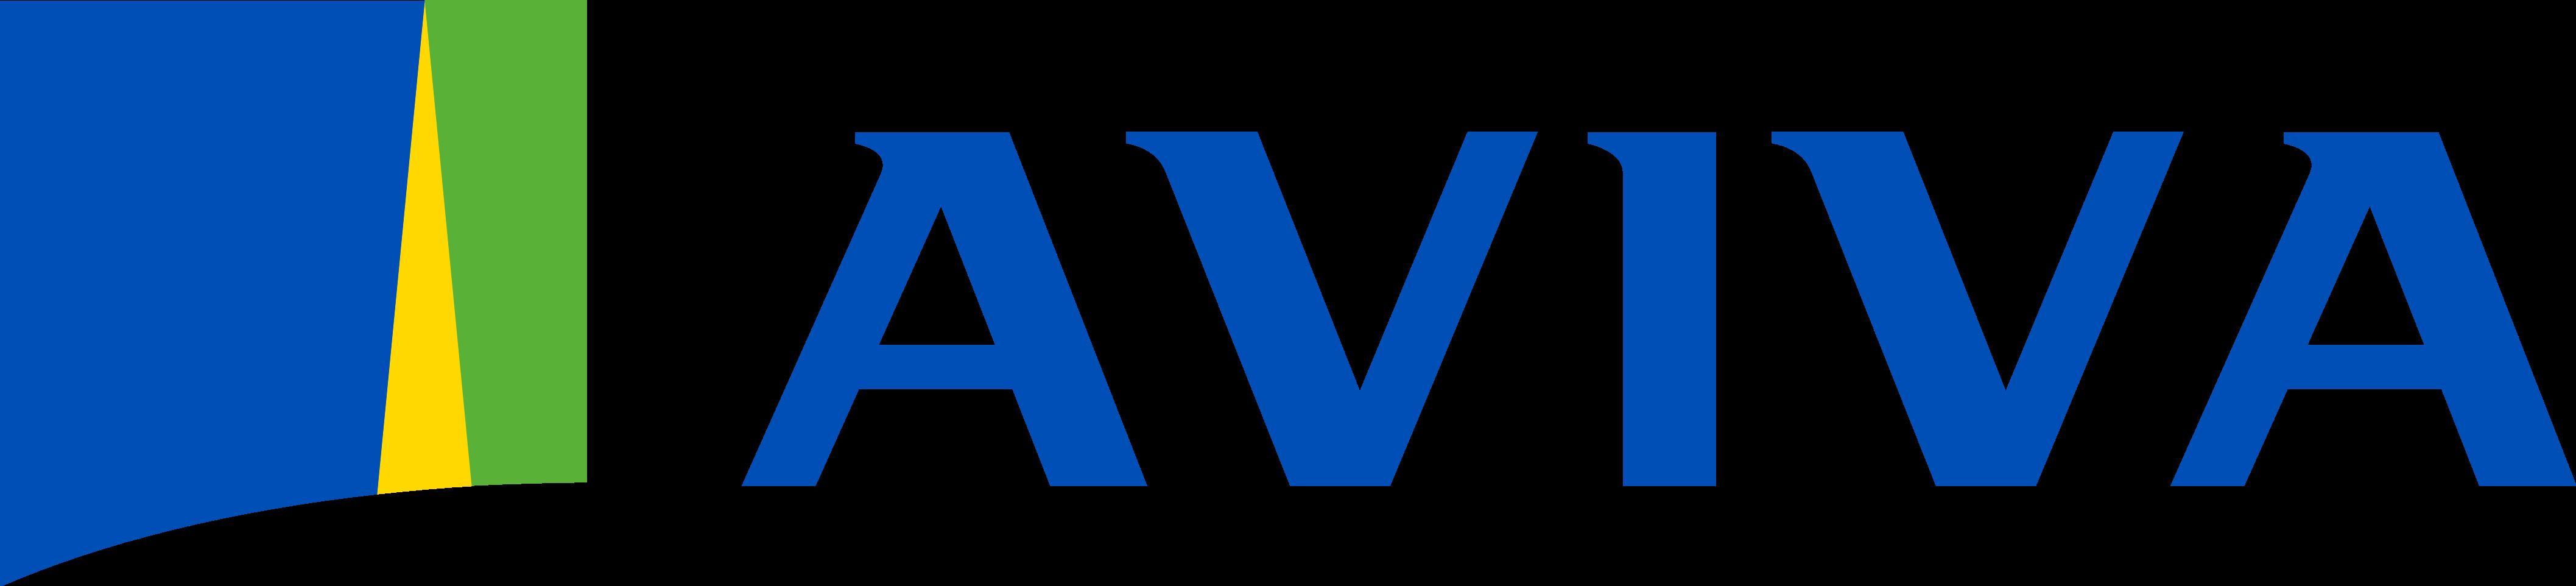 aviva logo logotype